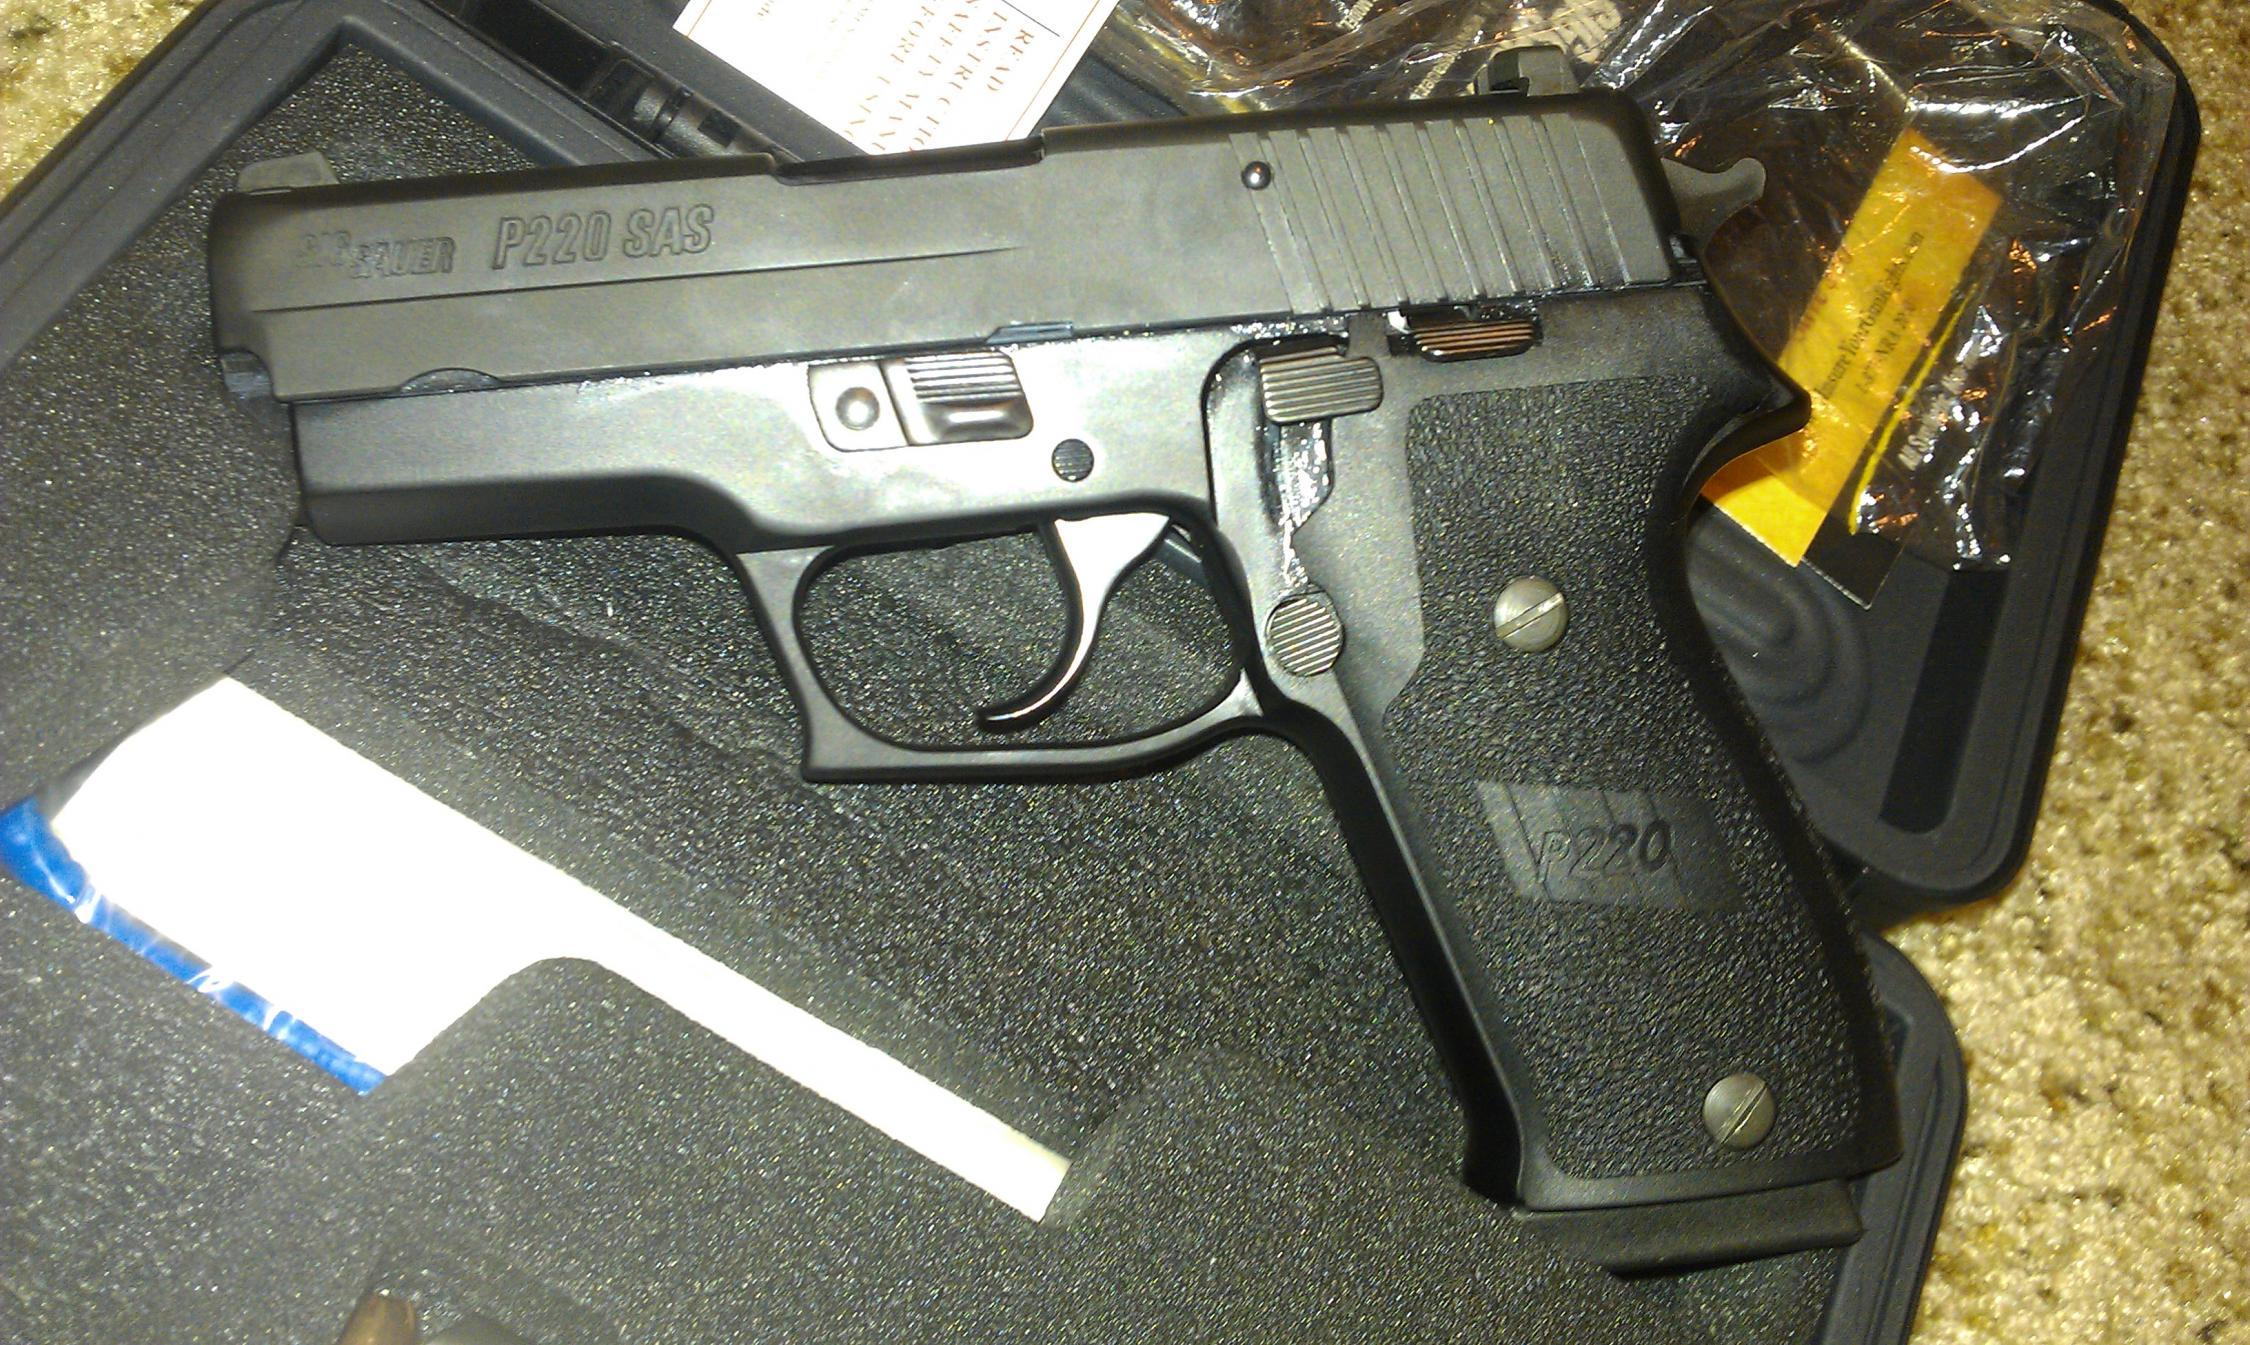 new Sig P220 Compact SAS-imag0274.jpg